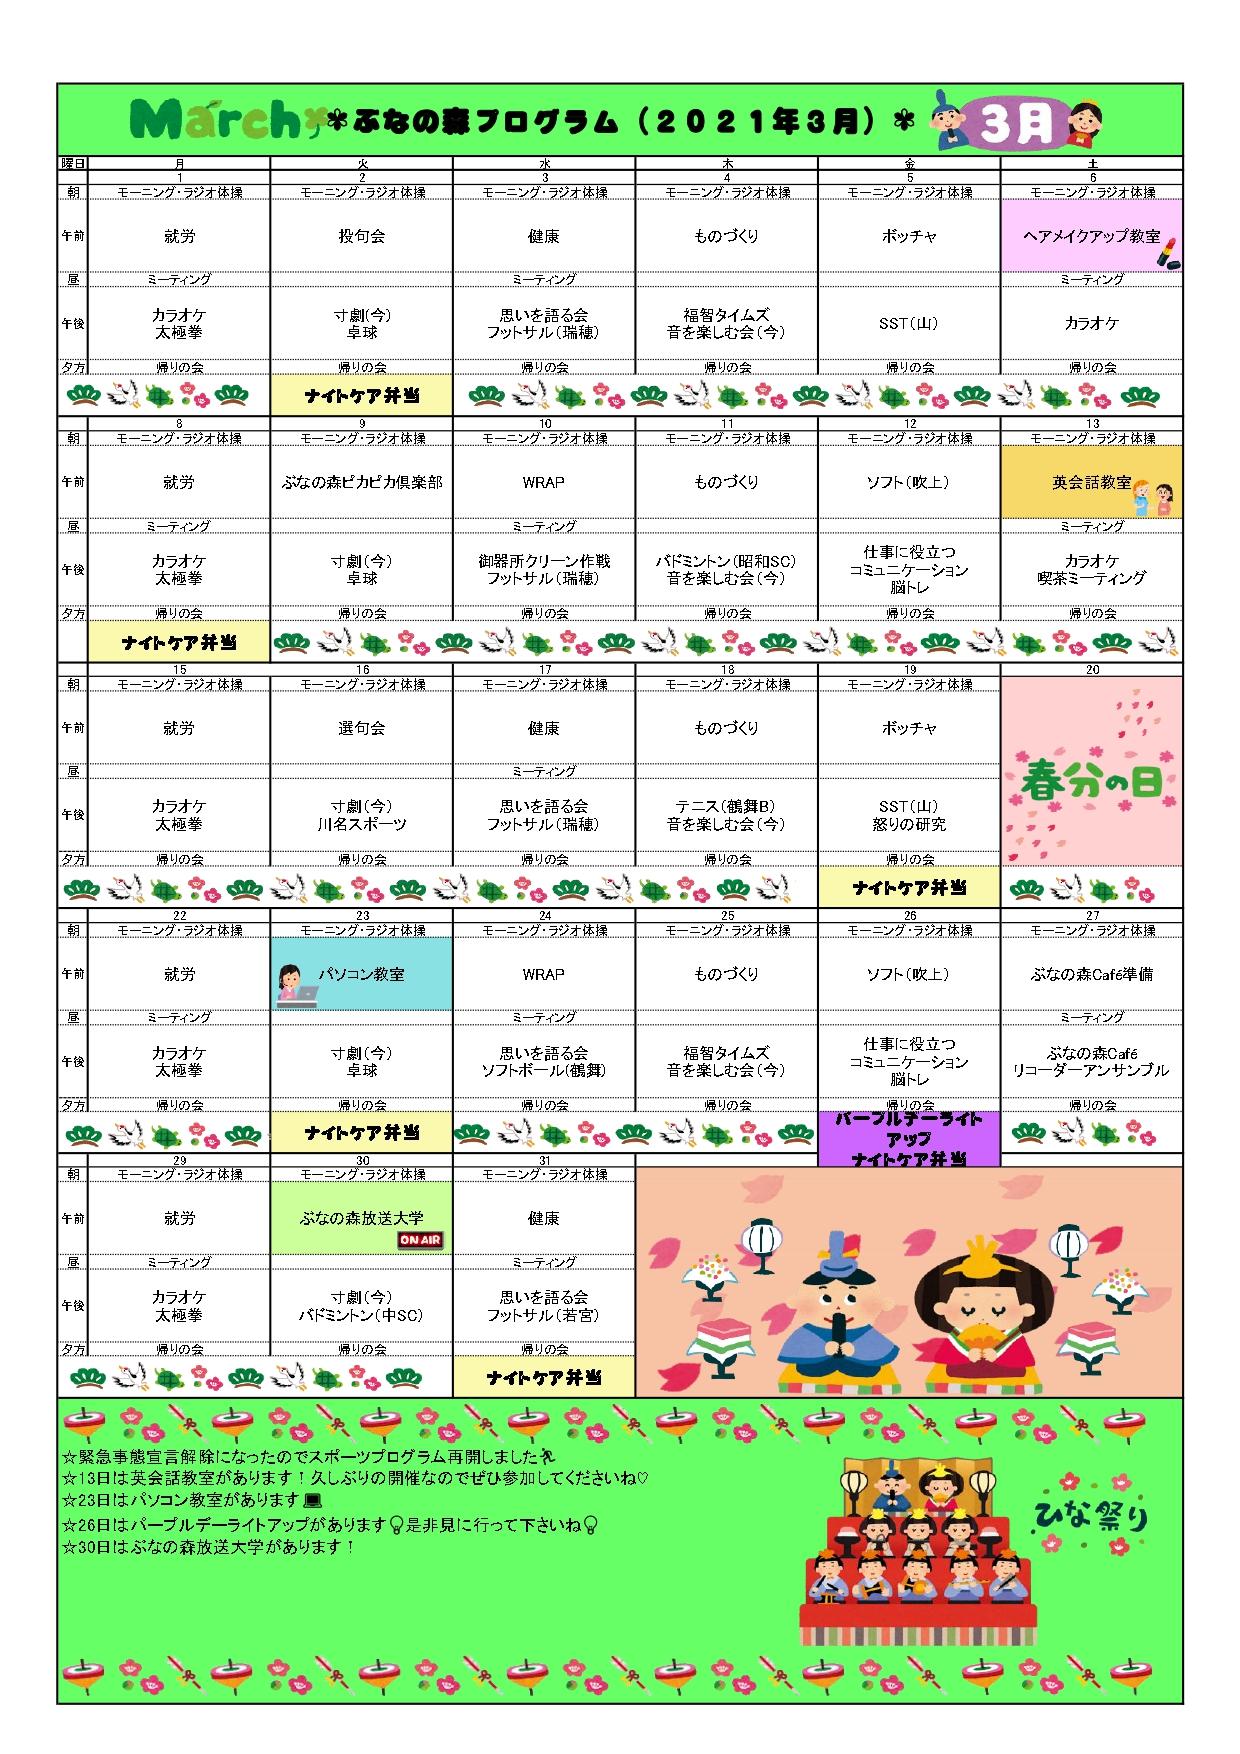 https://www.fukuchi-clinic.com/diaryblog/program%202021.3.jpg